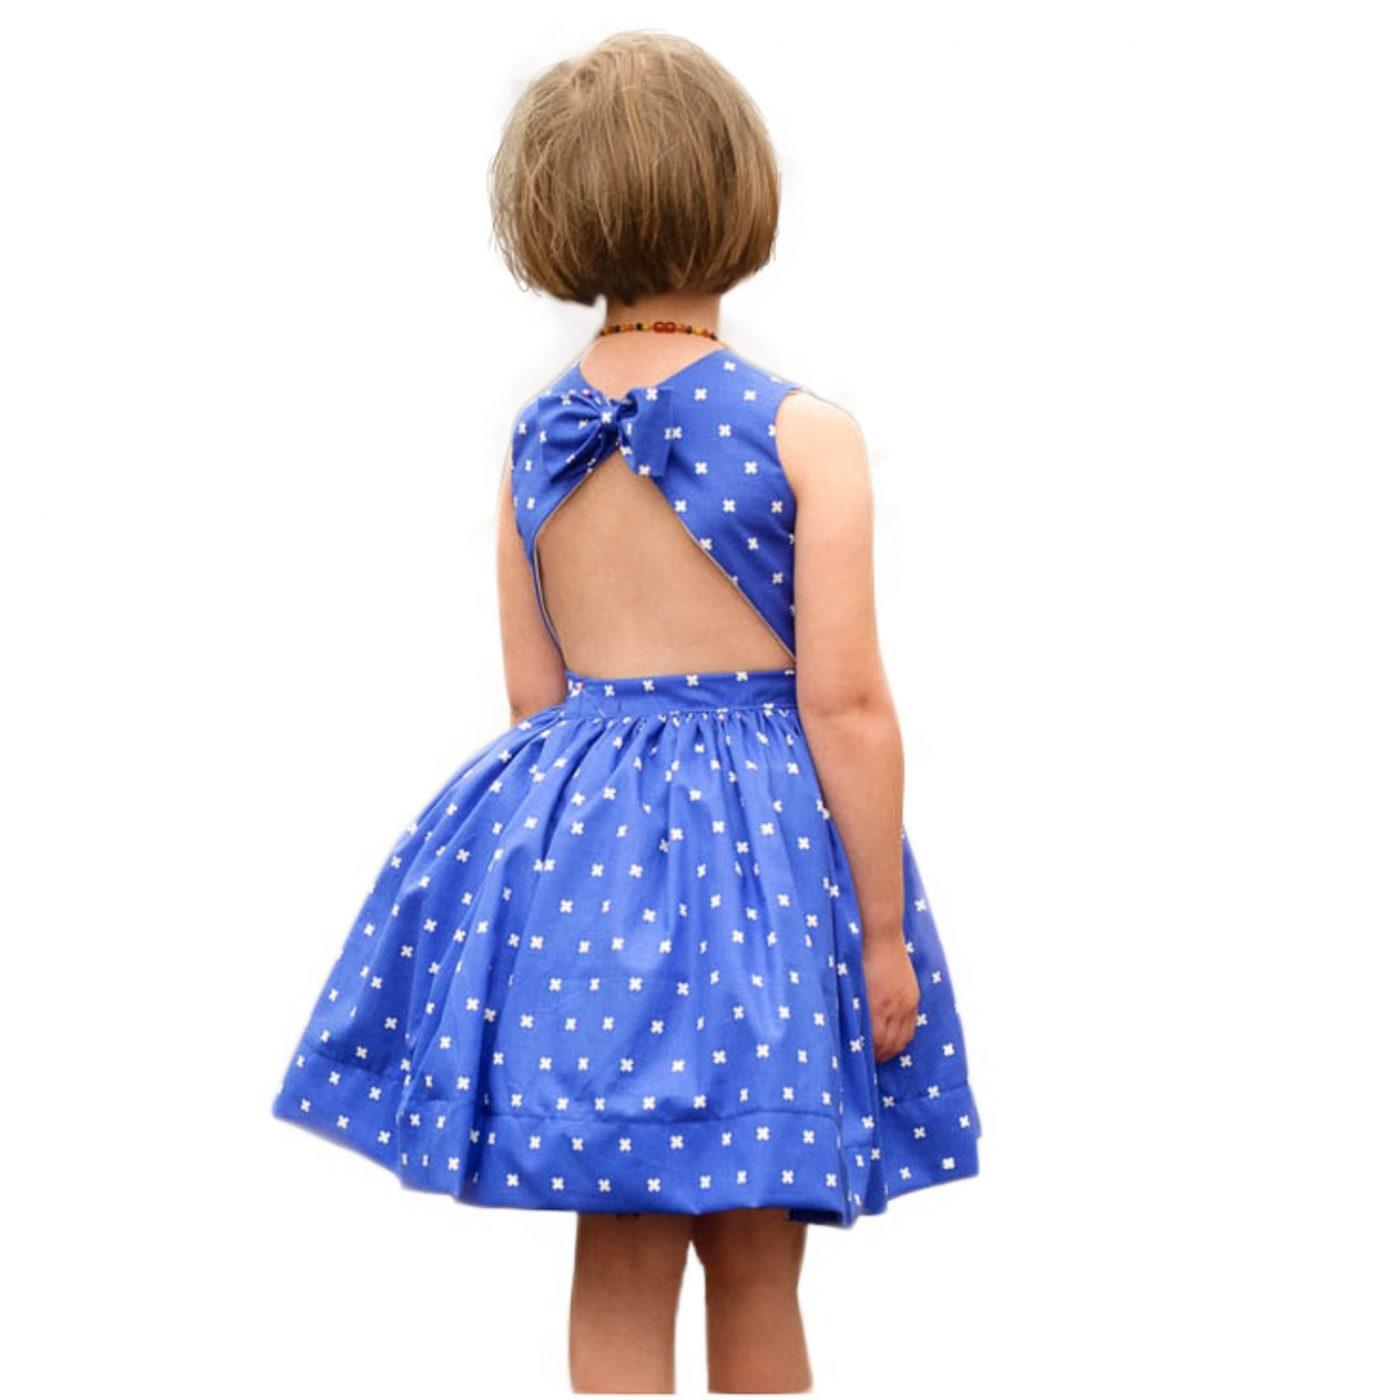 The Appelstroop Dress Sewing Pattern